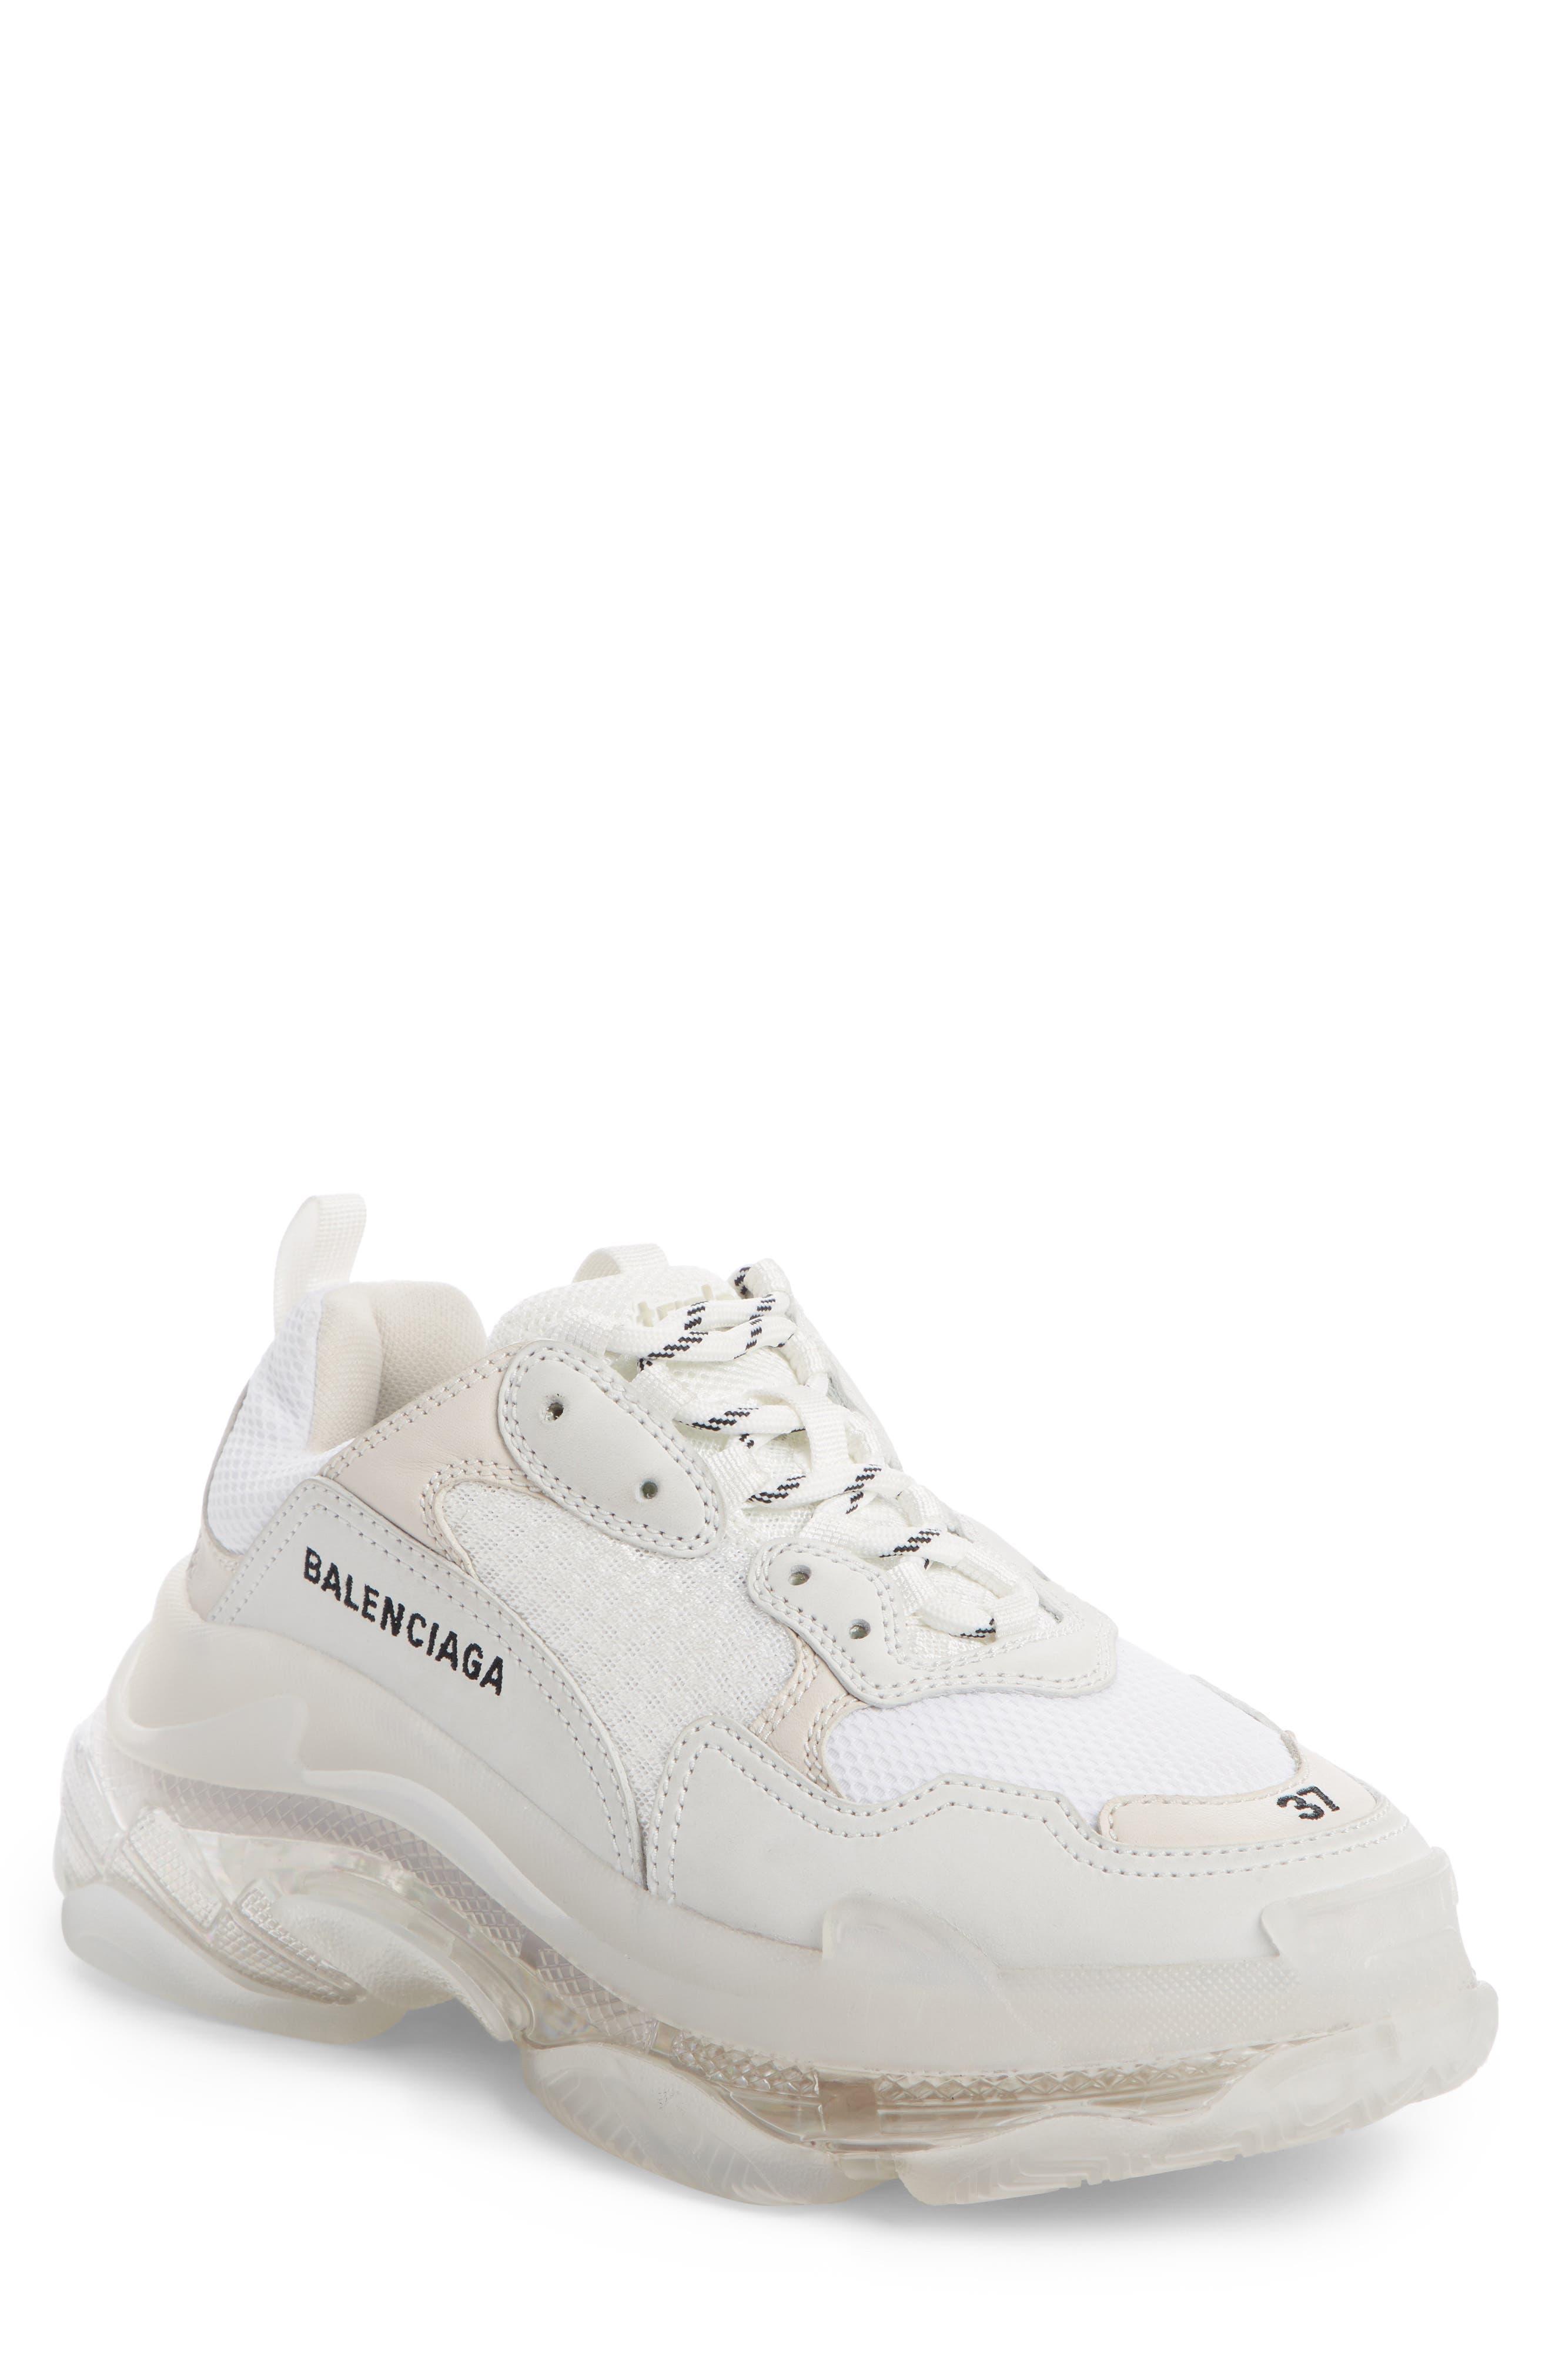 Sneakers & Tennis Shoes for Women Nordström Rack    Balenciaga kvinnor   title=          Nordstrom